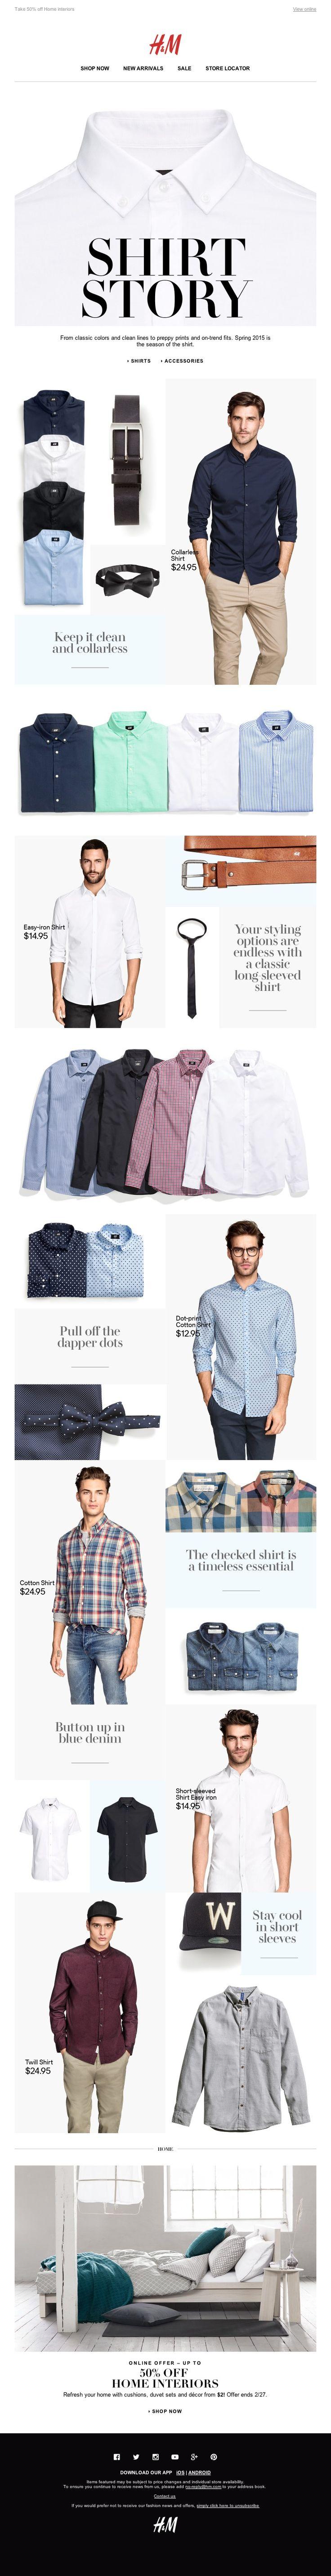 H&M - Shirt Story